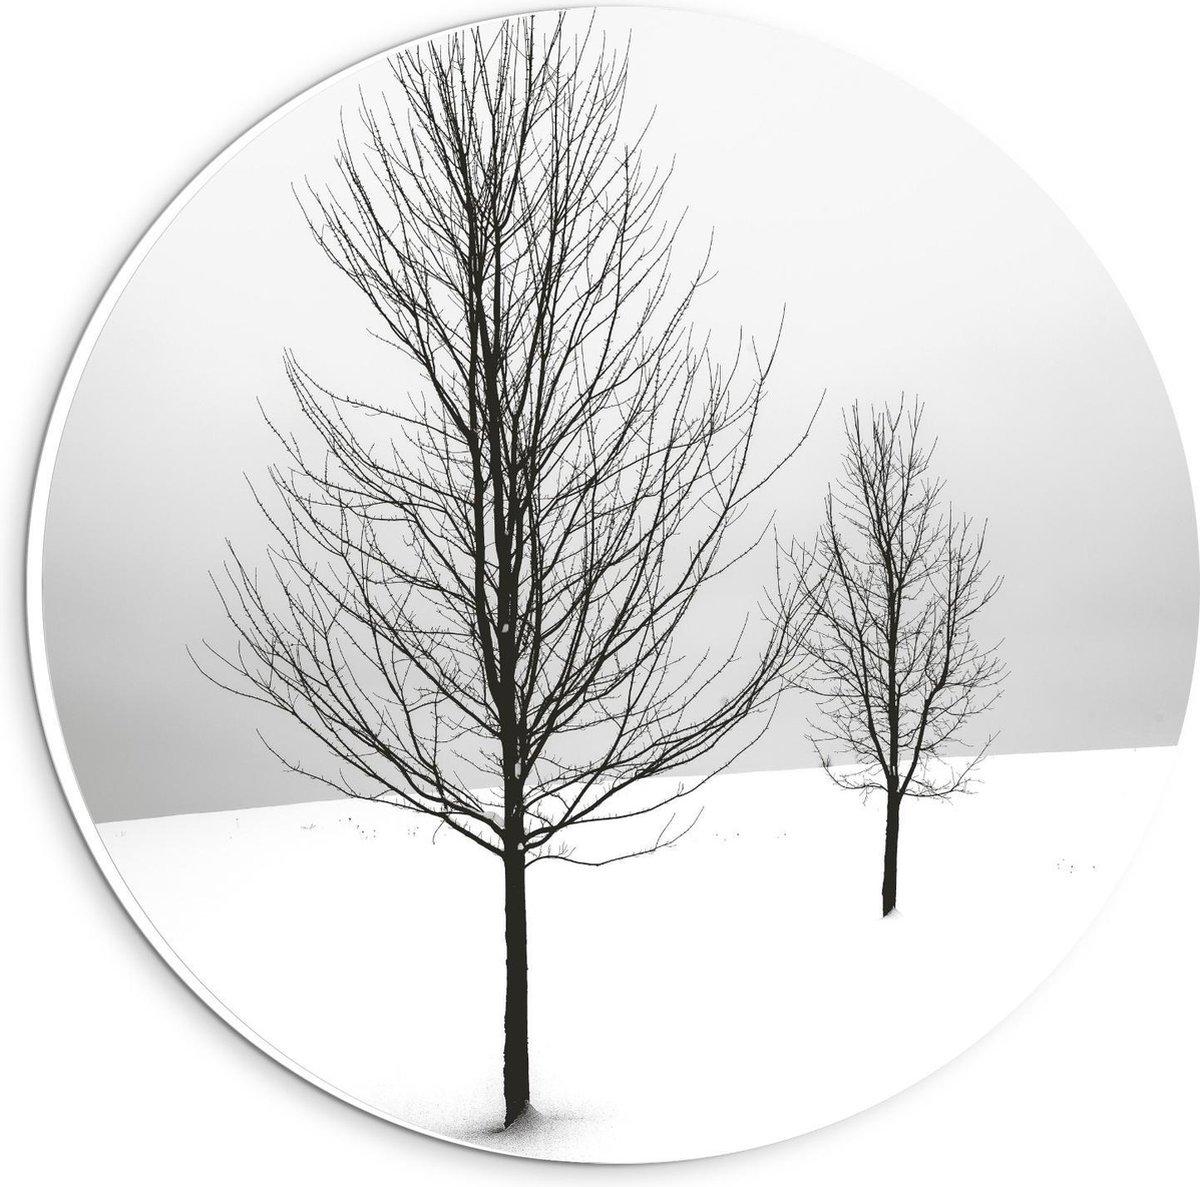 Forex Wandcirkel - Bomen op Besneeuwd Gebied - 20x20cm Foto op Wandcirkel (met ophangsysteem)